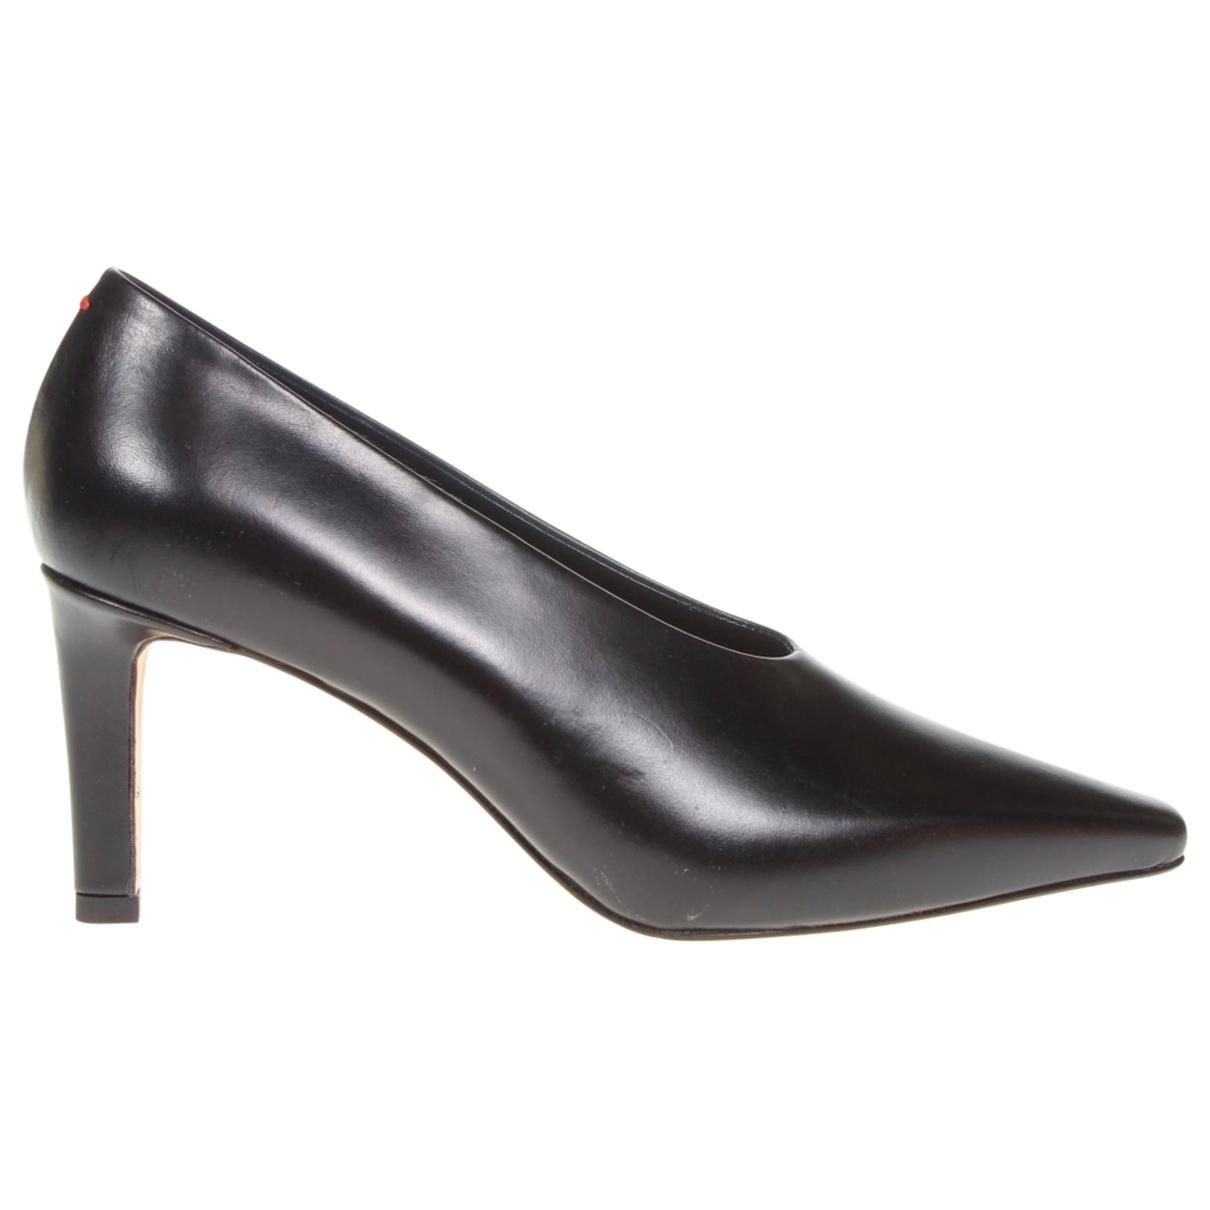 Aeyde \N Black Leather Heels for Women 37.5 EU